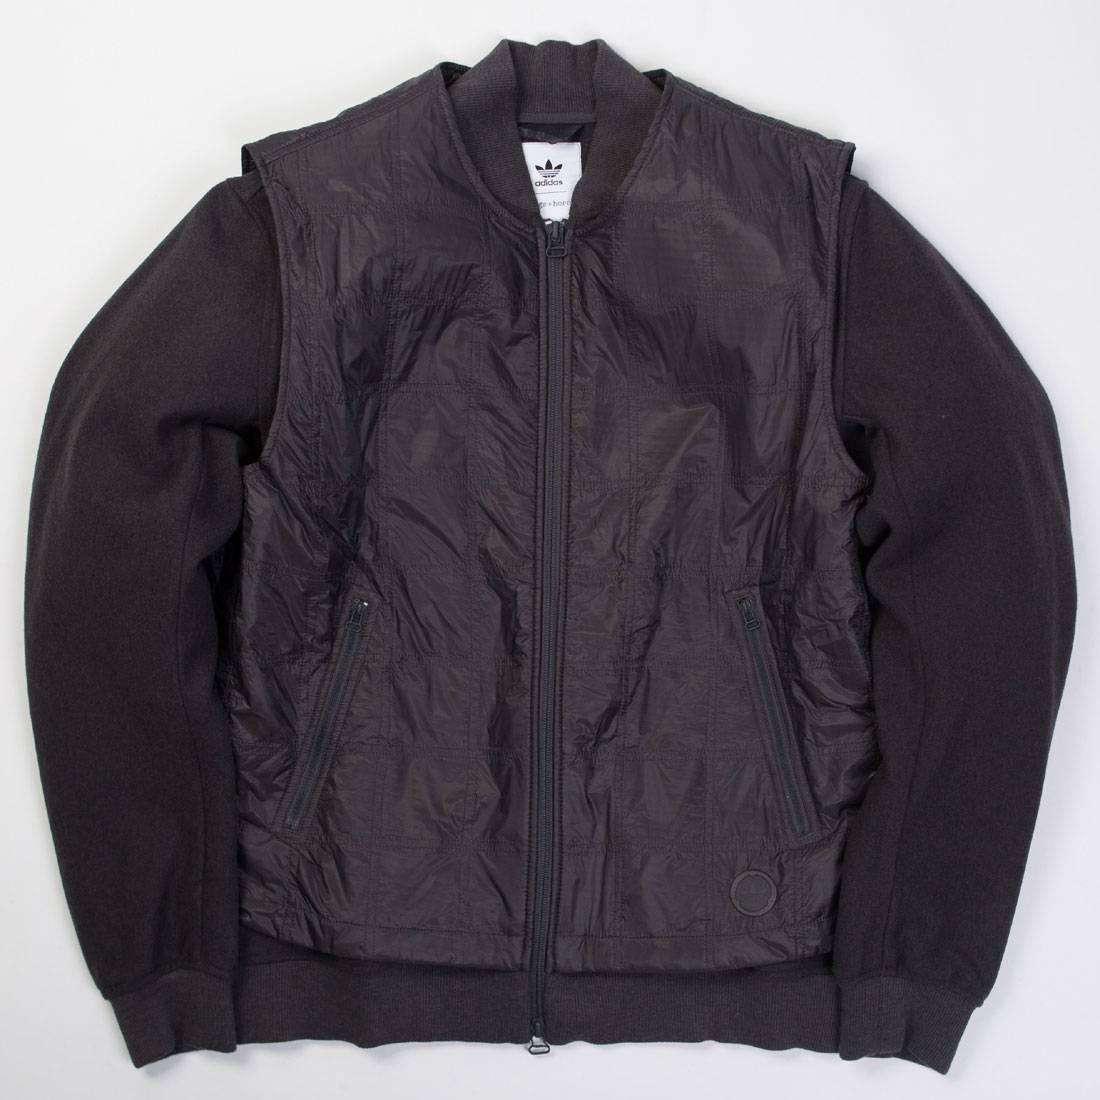 Adidas x Wings + Horns Men Bomber Jacket (black utility black)